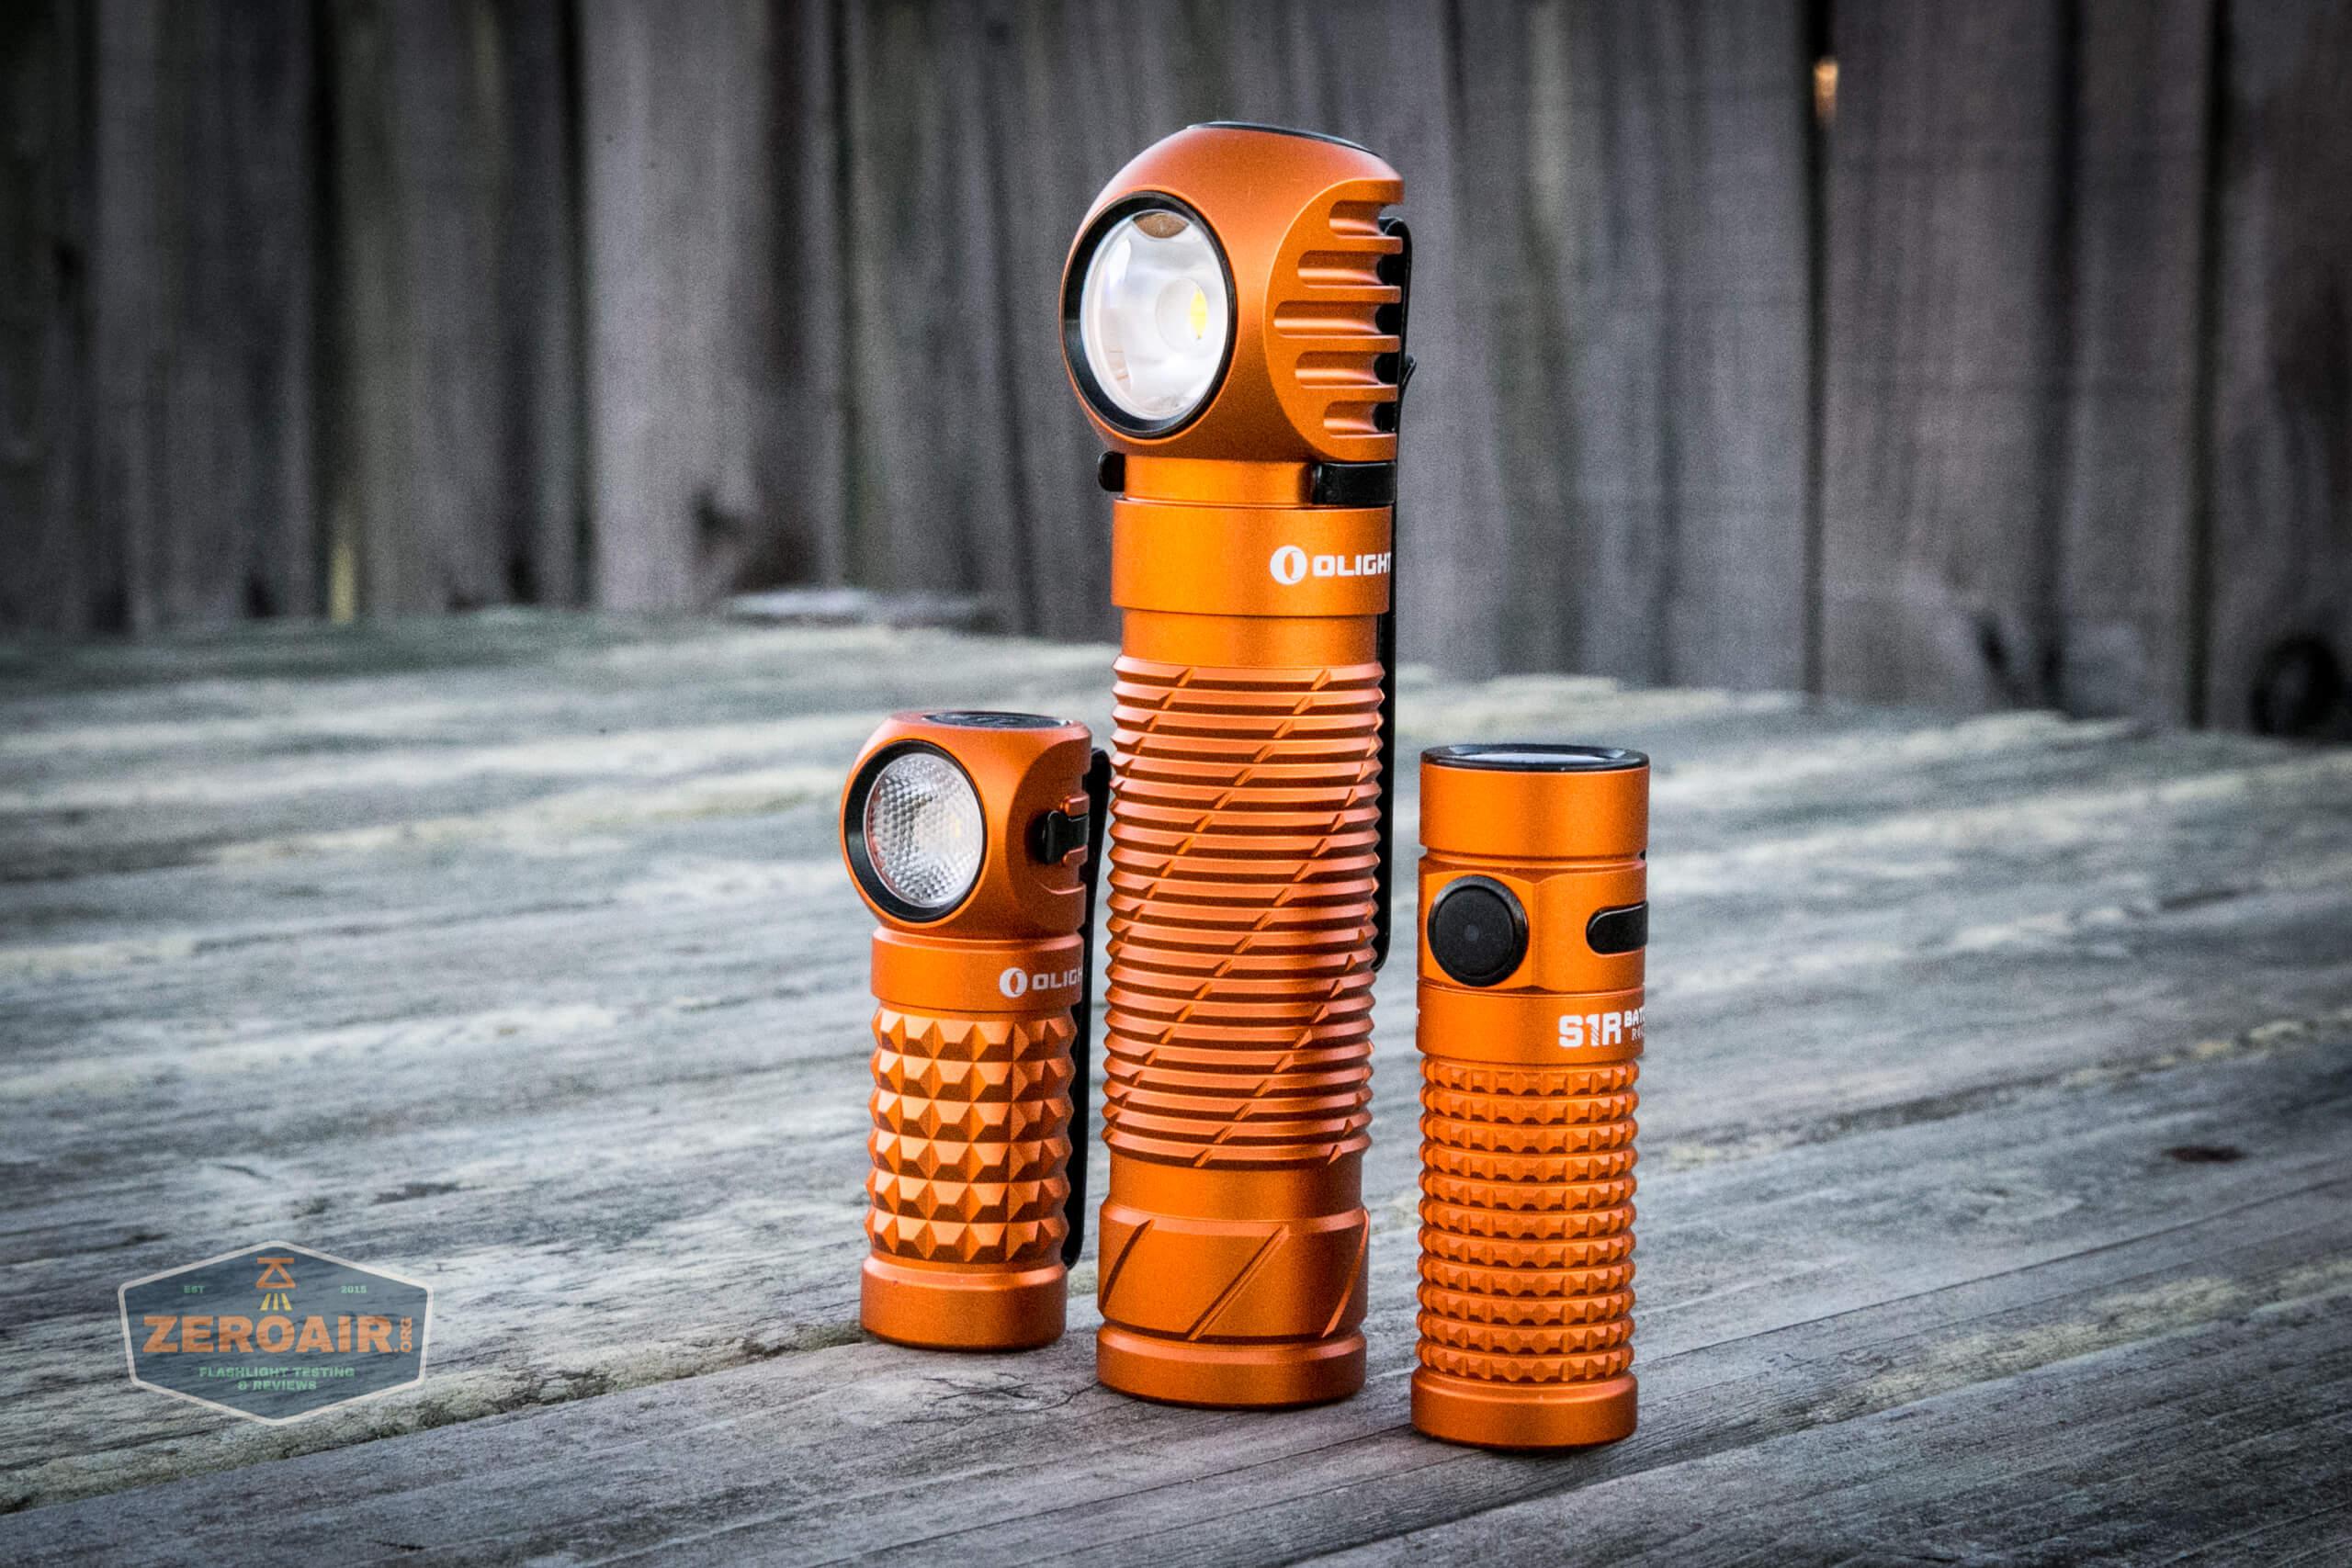 olight perun 2 21700 headlamp orange beside other orange olights